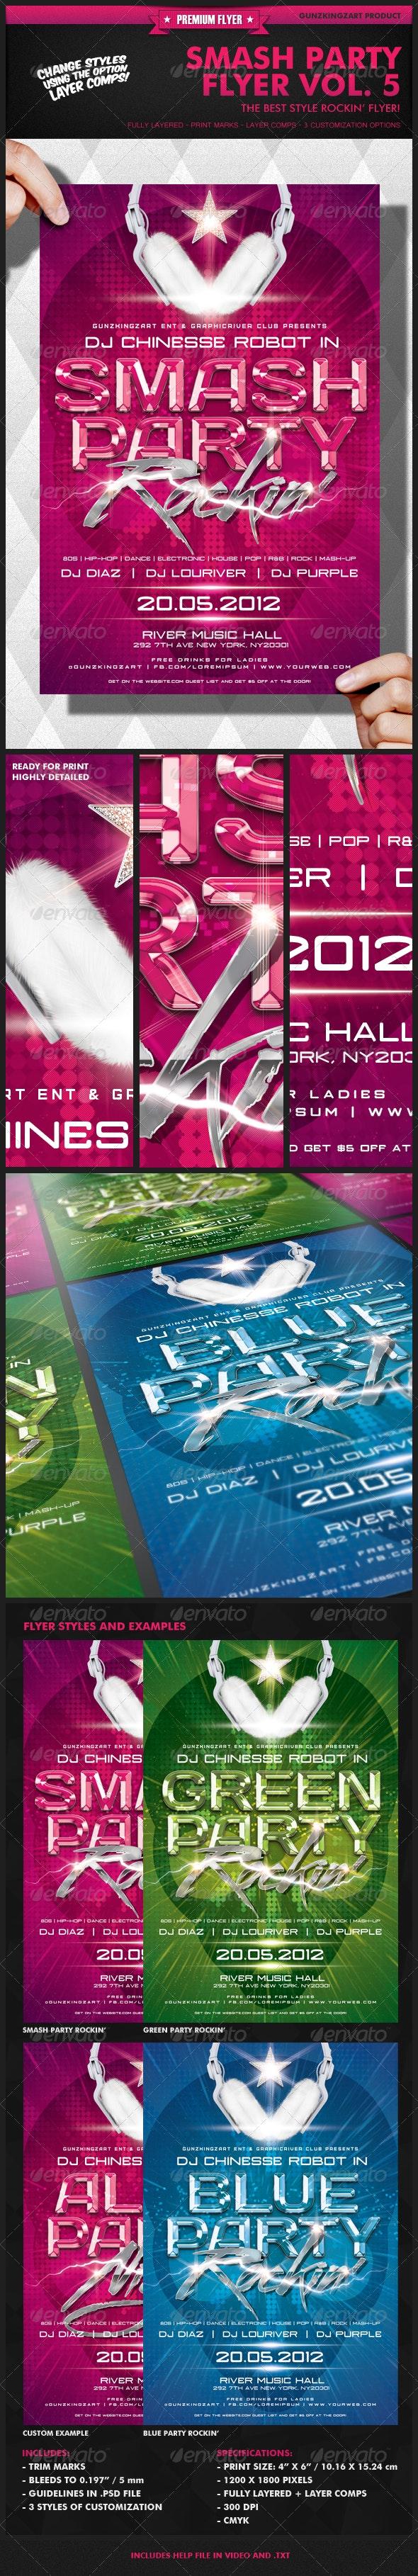 Smash Party Flyer Vol. 5 - Clubs & Parties Events